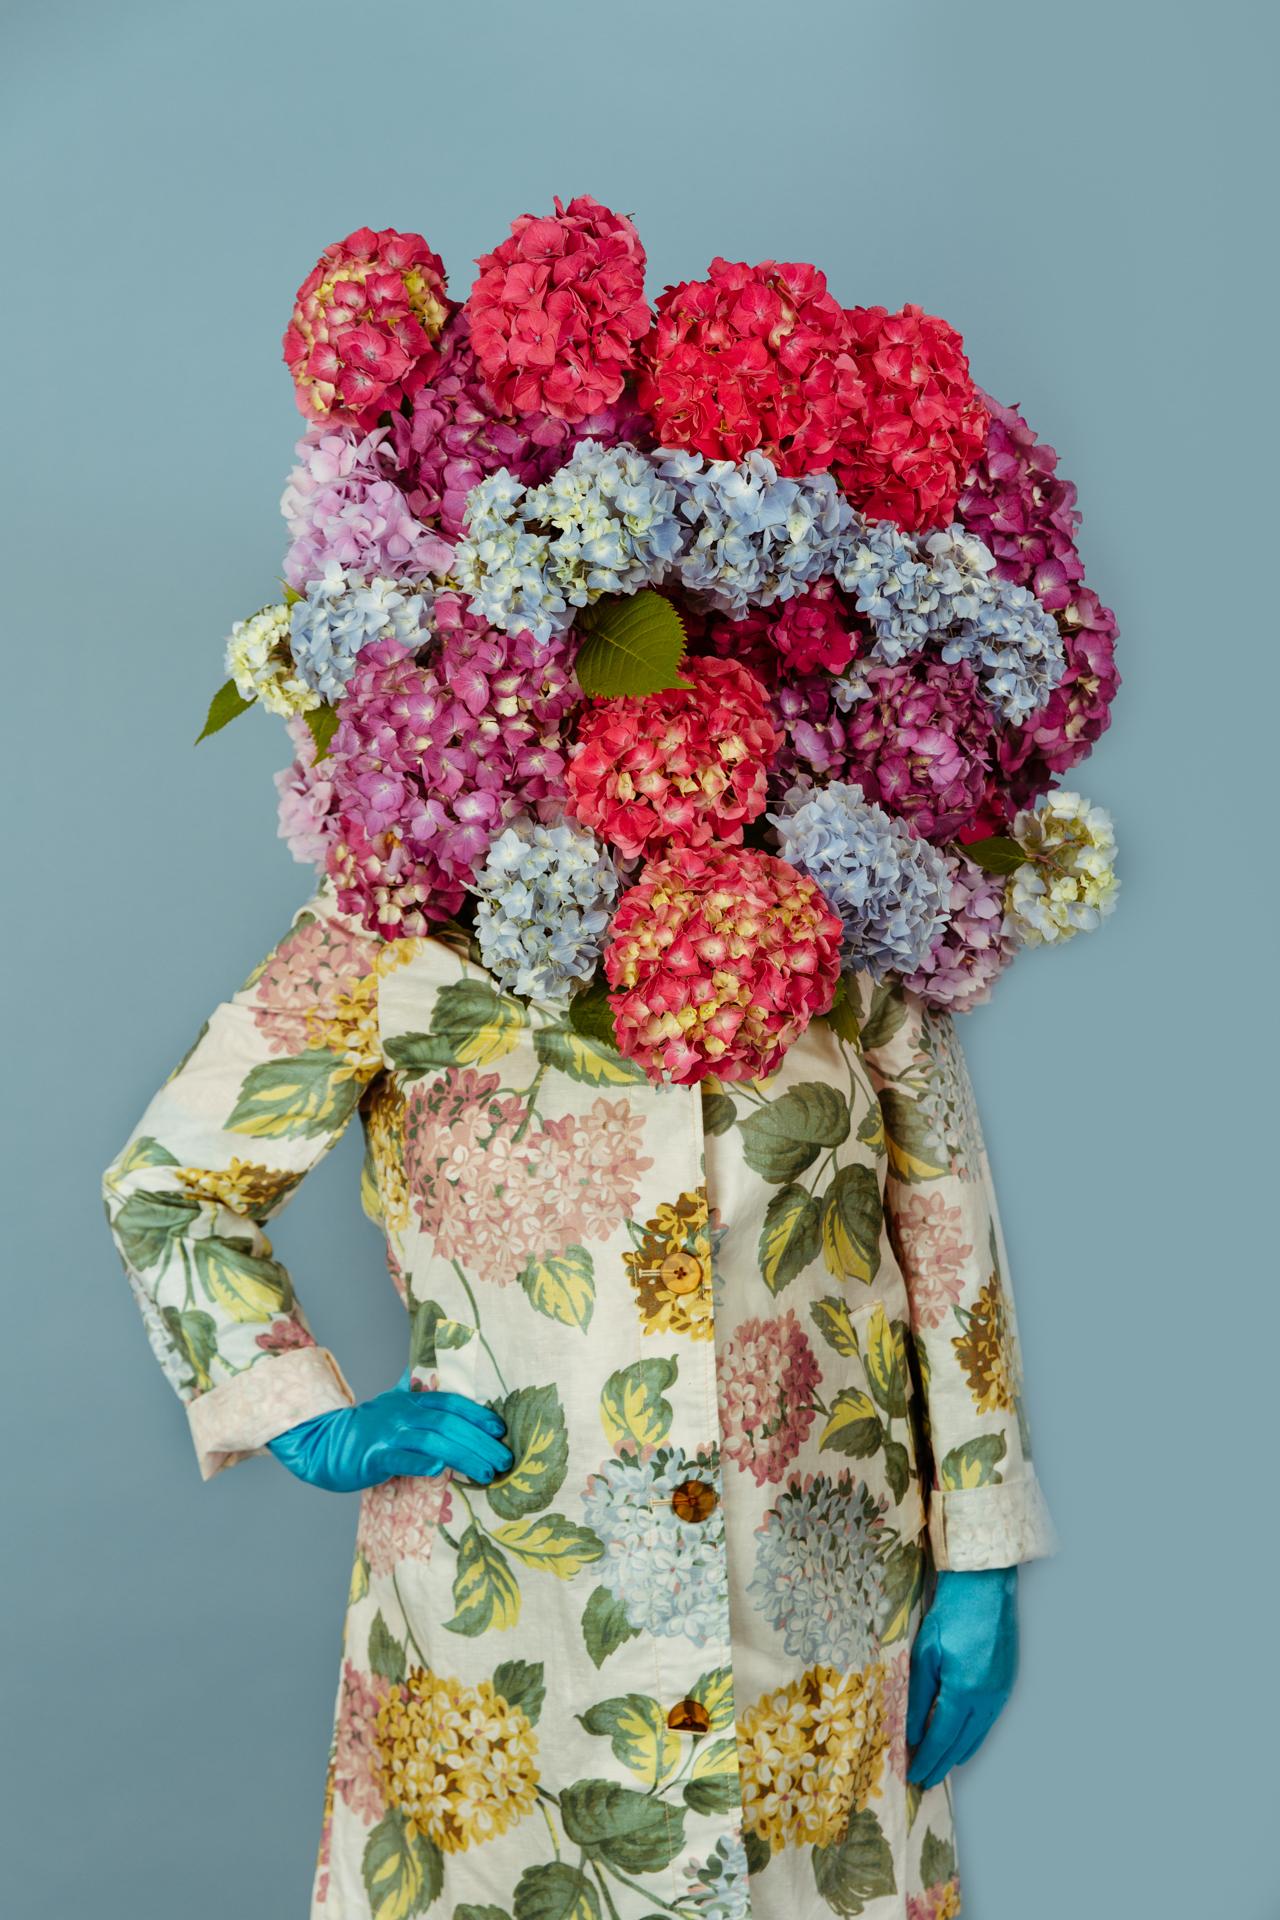 Flower_head-1.JPG